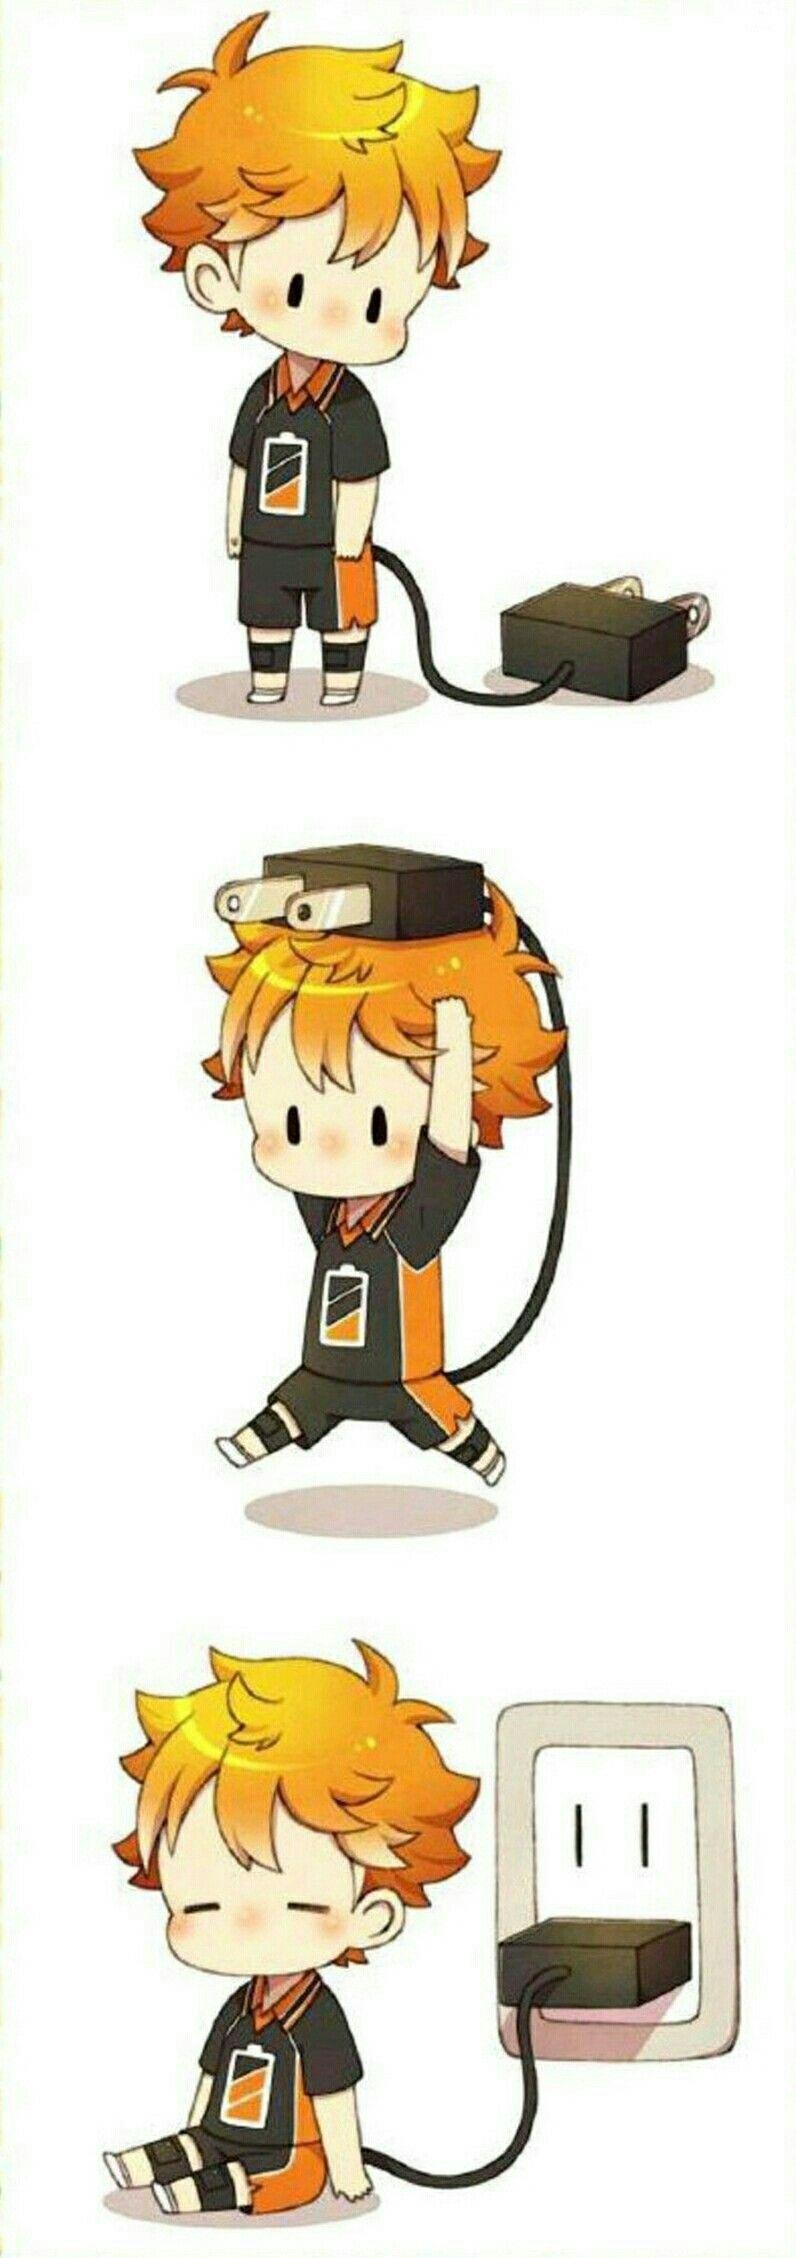 Pin de ♚Trash King♚ en Hinata Shoyo!♡   Pinterest   Dibujos ...